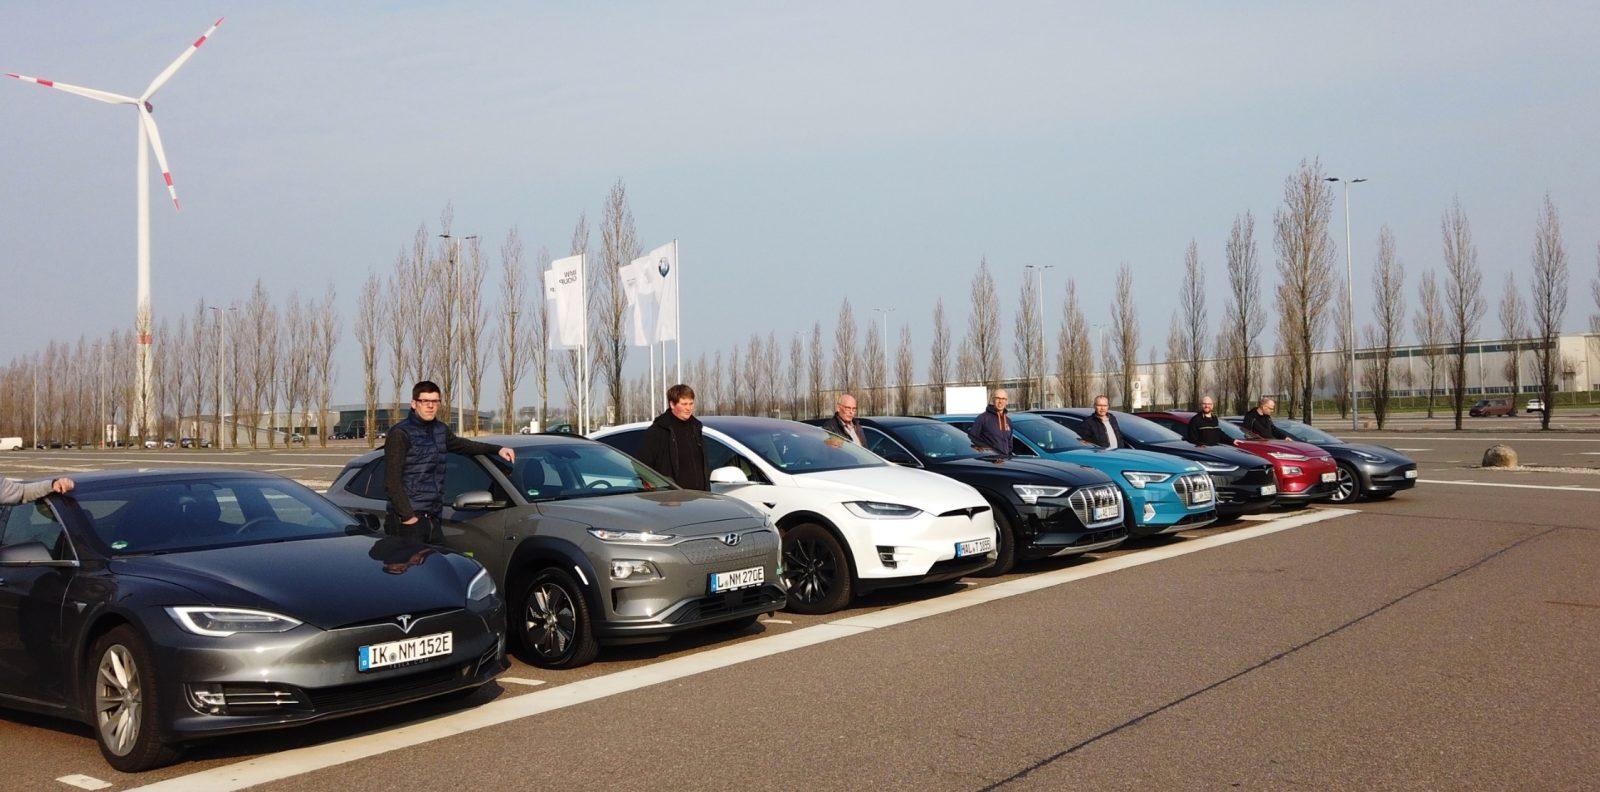 Tesla dominates EV efficiency at high speed, shows extensive test against Kona EV and Audi e-tron